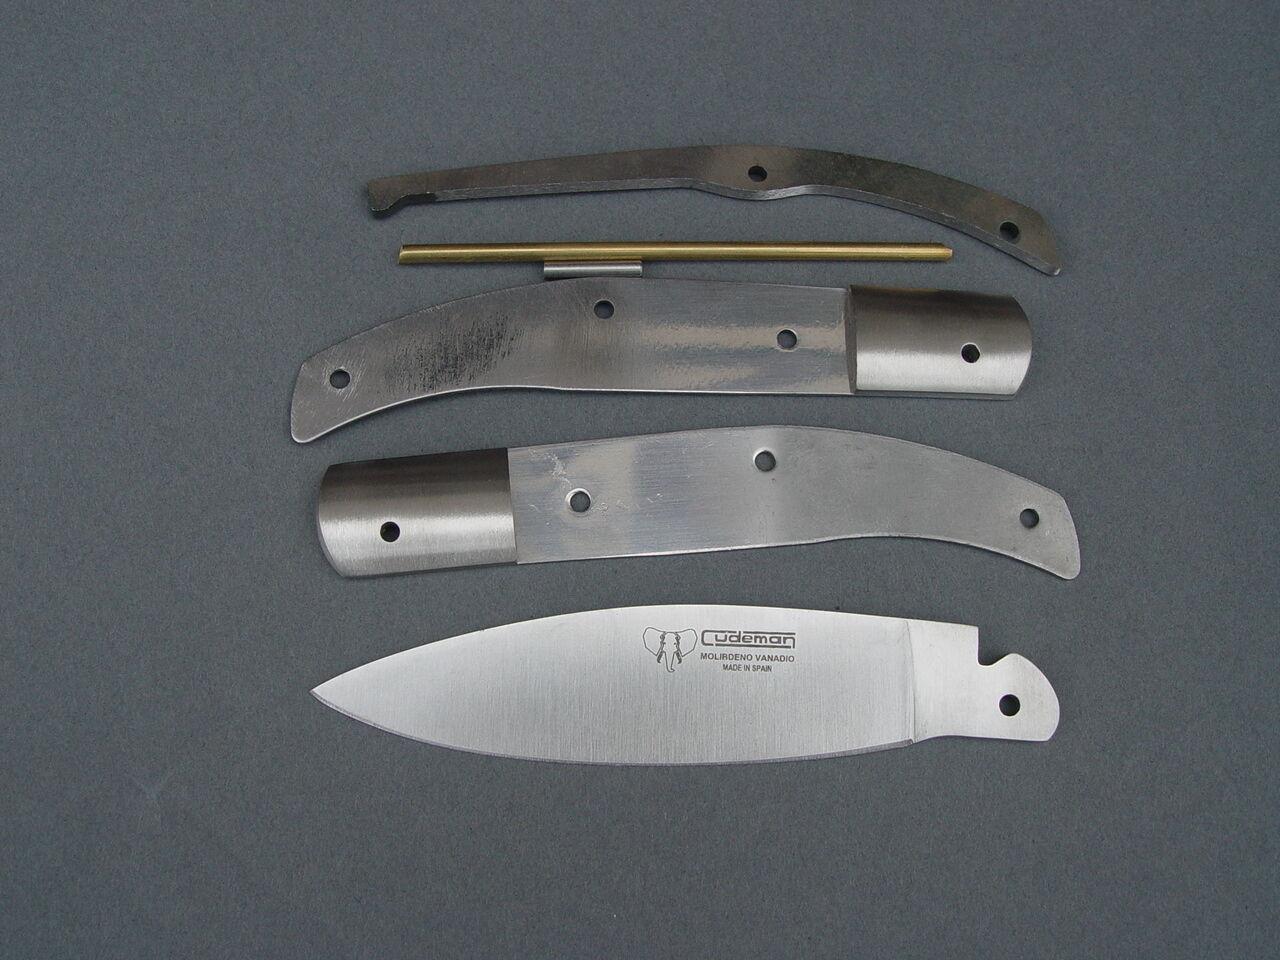 Couteau de poche Kit cudemann 417 417 417 Messerbau 03a0f8